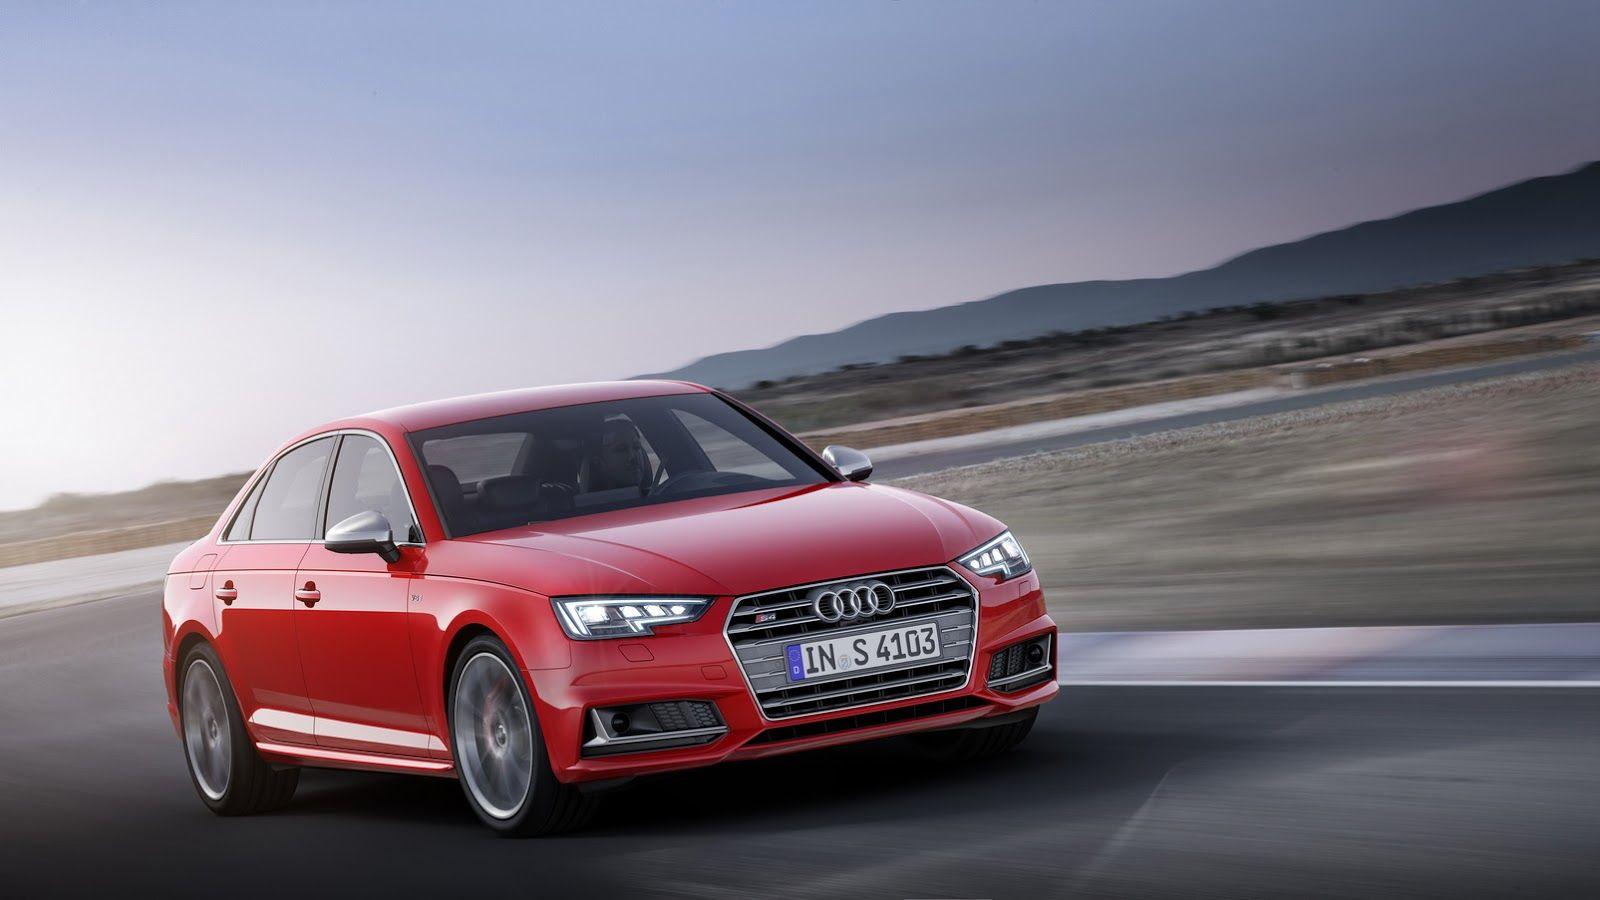 Audi Brings Speedy S4 S4 Avant To Frankfurt W Video Audi S4